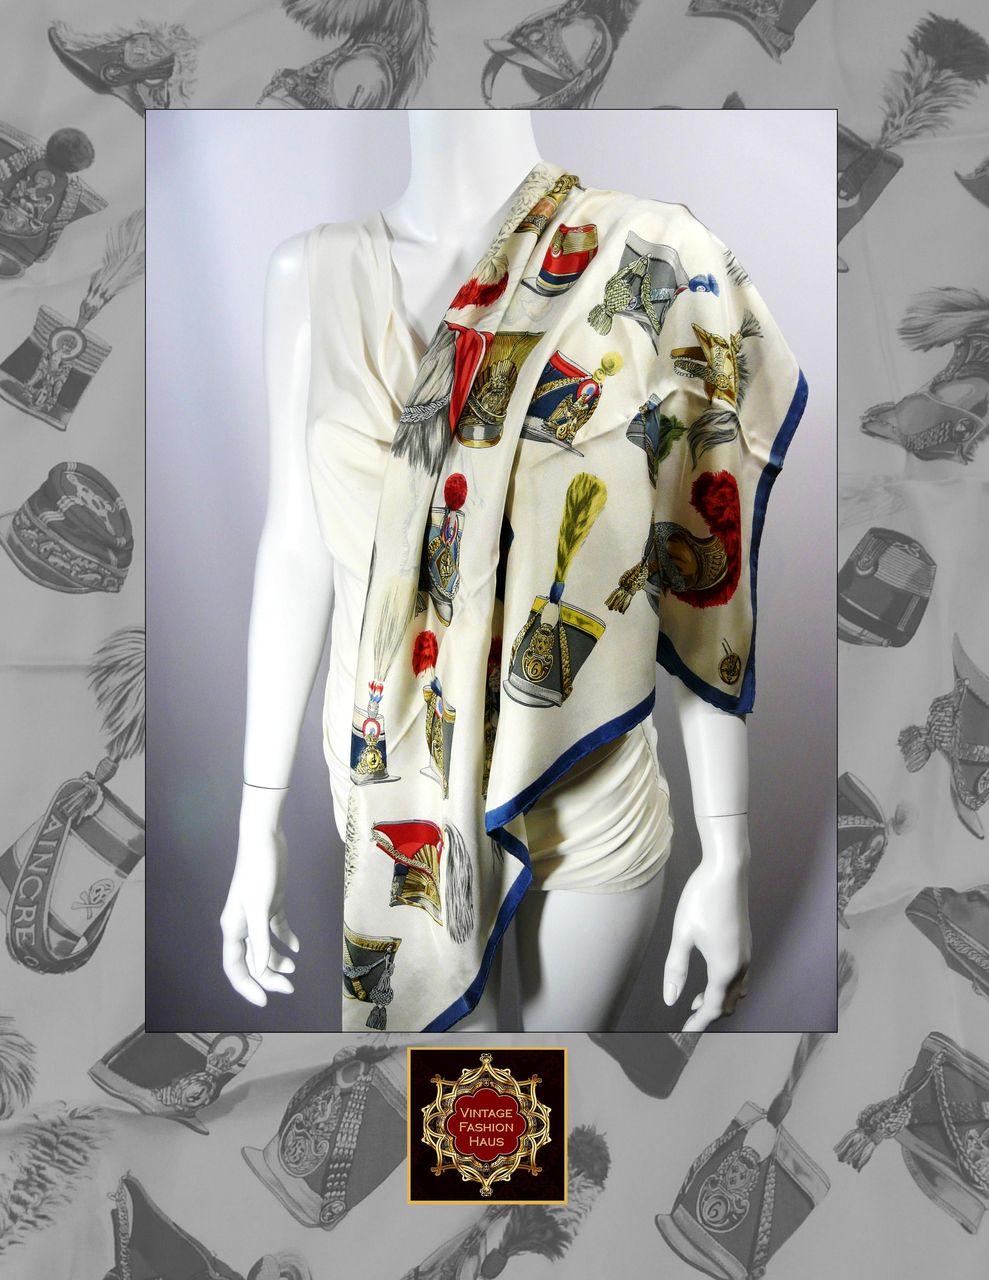 Authentic Vintage Hermes Silk Scarf  Carre Casques et Coiffures  Authentic Vintage Hermes Scarves